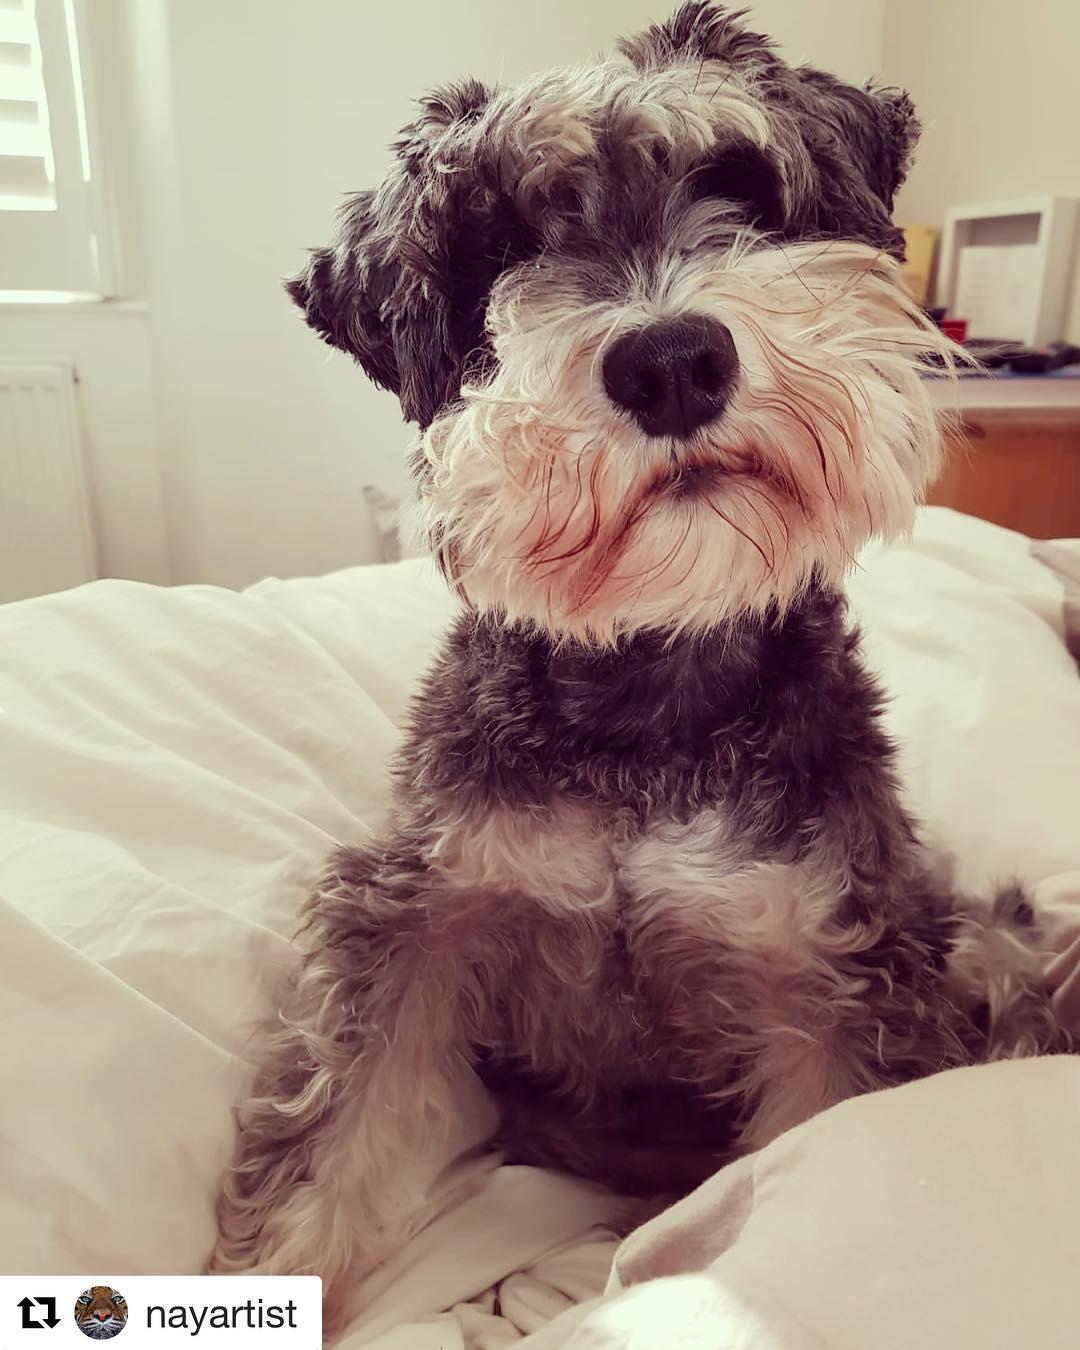 Laurel, now called Bessie, living happily in Devon, pictured 2018